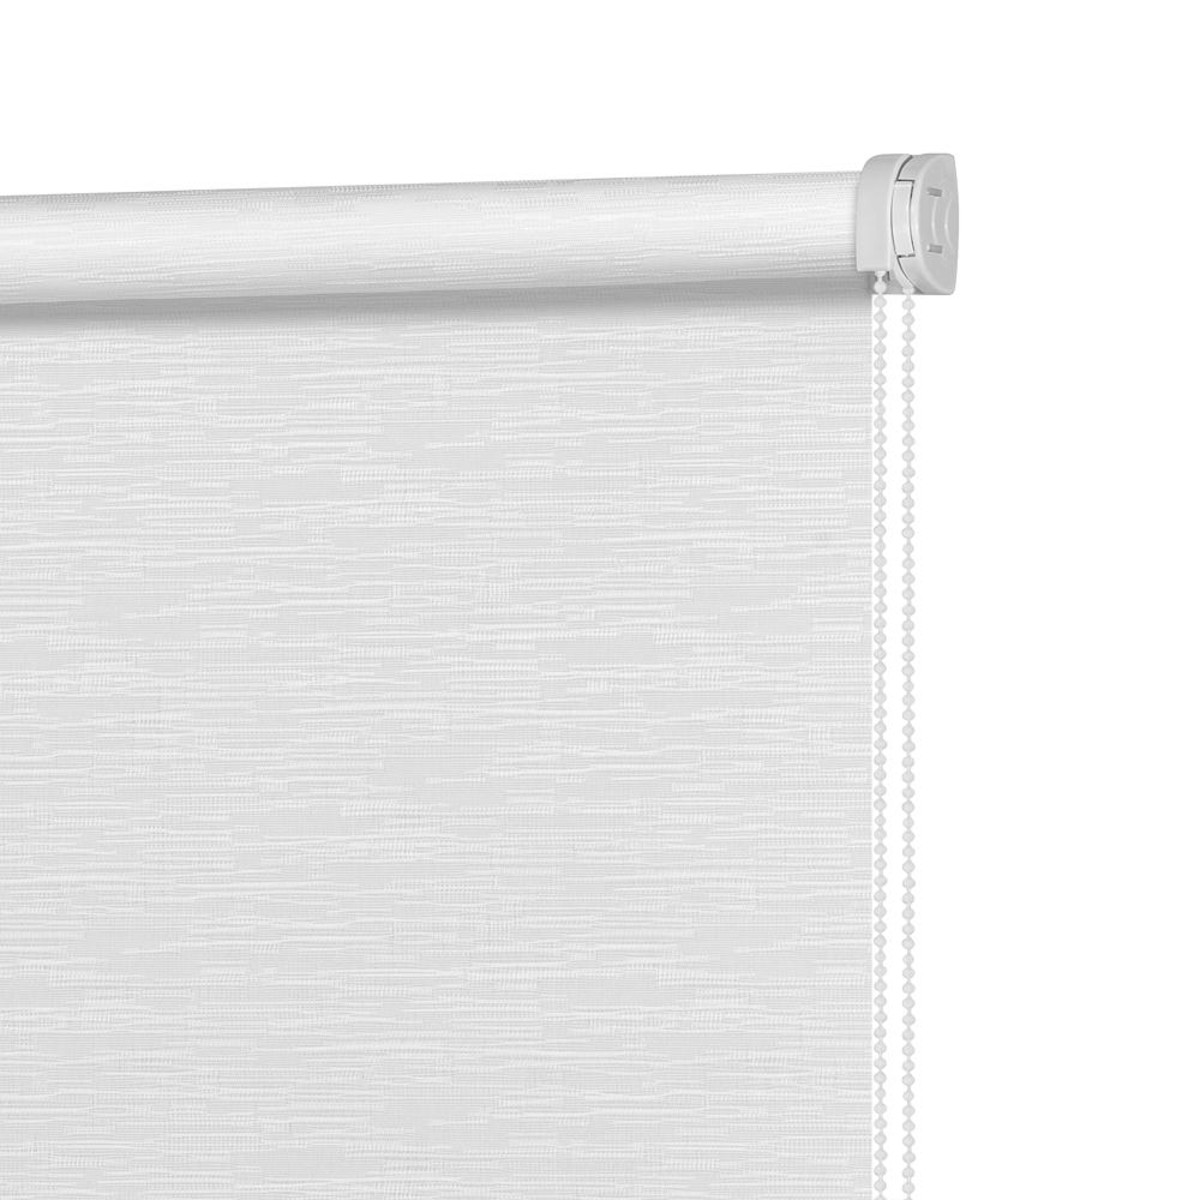 Рулонная Ора Decofest Эко 90Х160 Цвет Белый